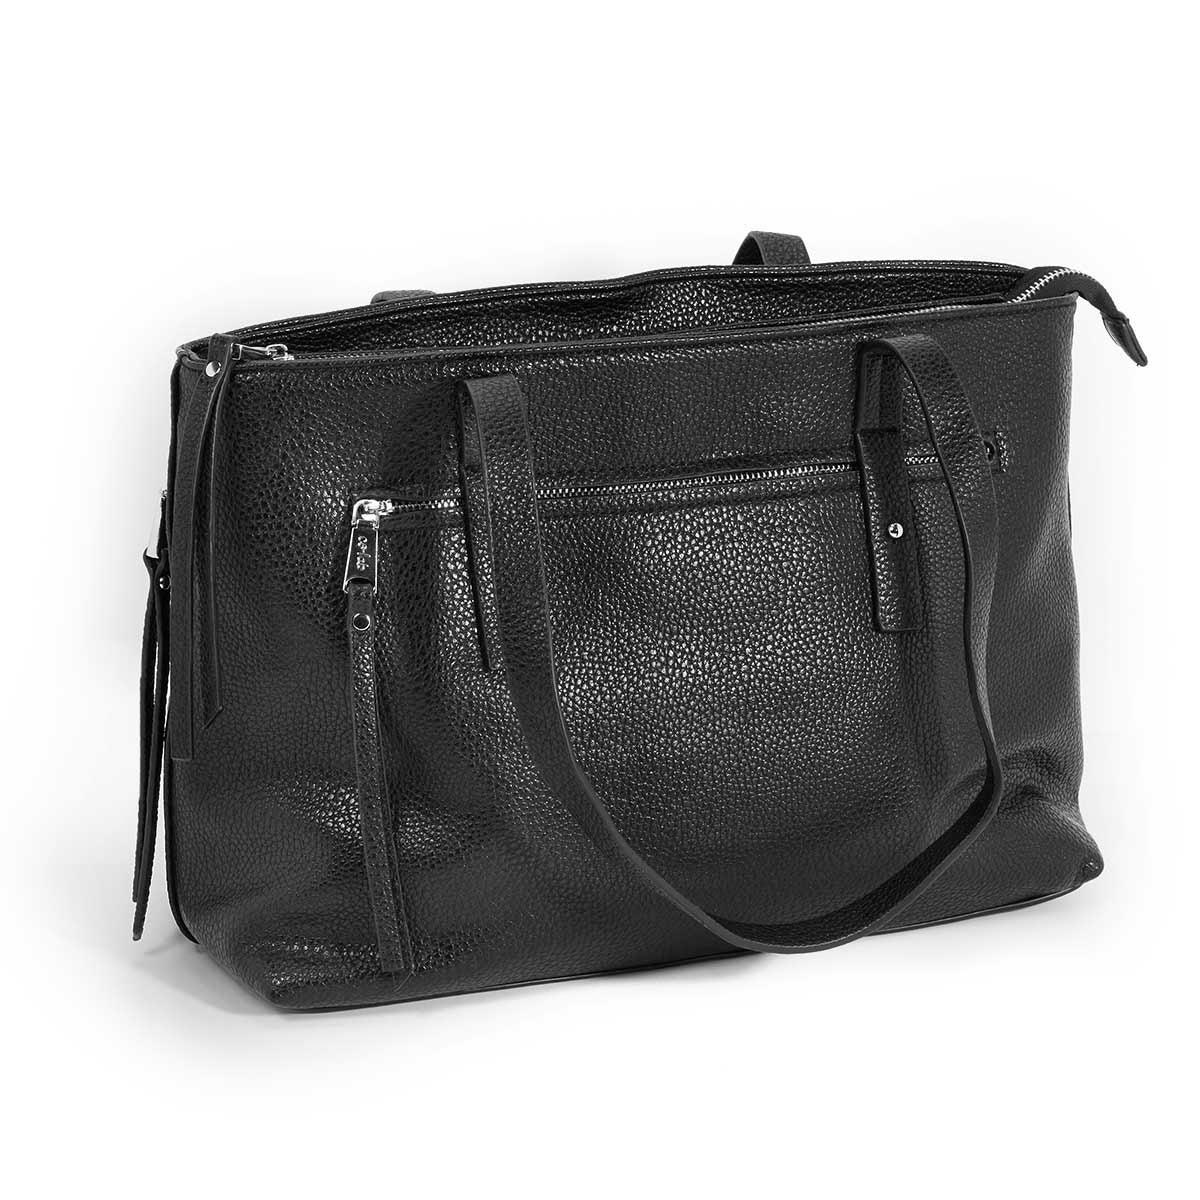 Lds Penny black tote bag